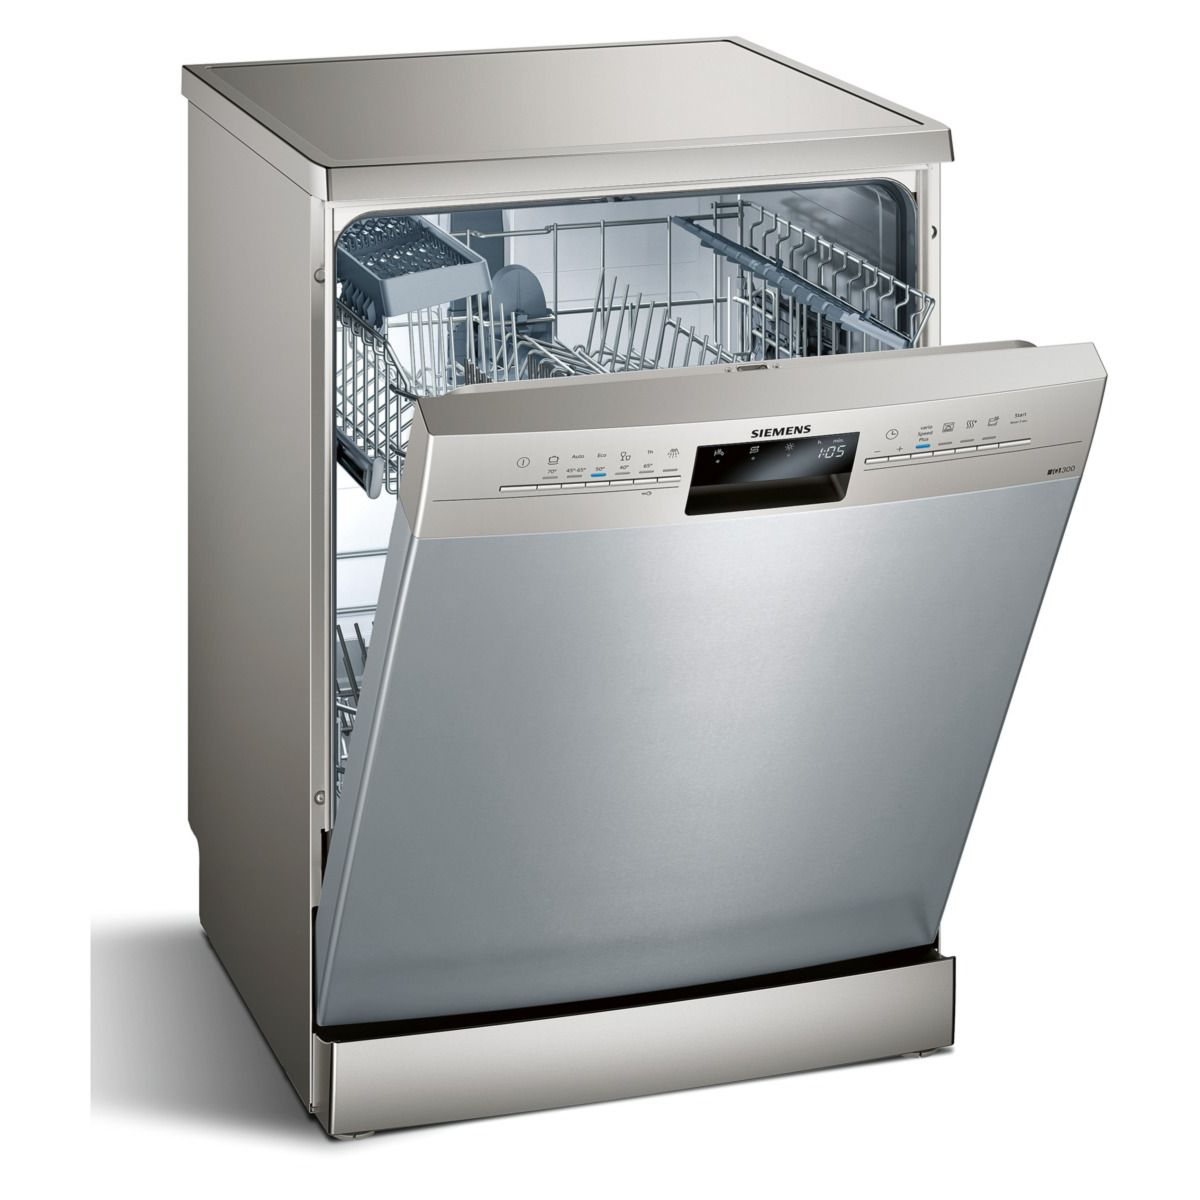 Lave-vaisselle 60cm SIEMENS SN236I00IE (photo)